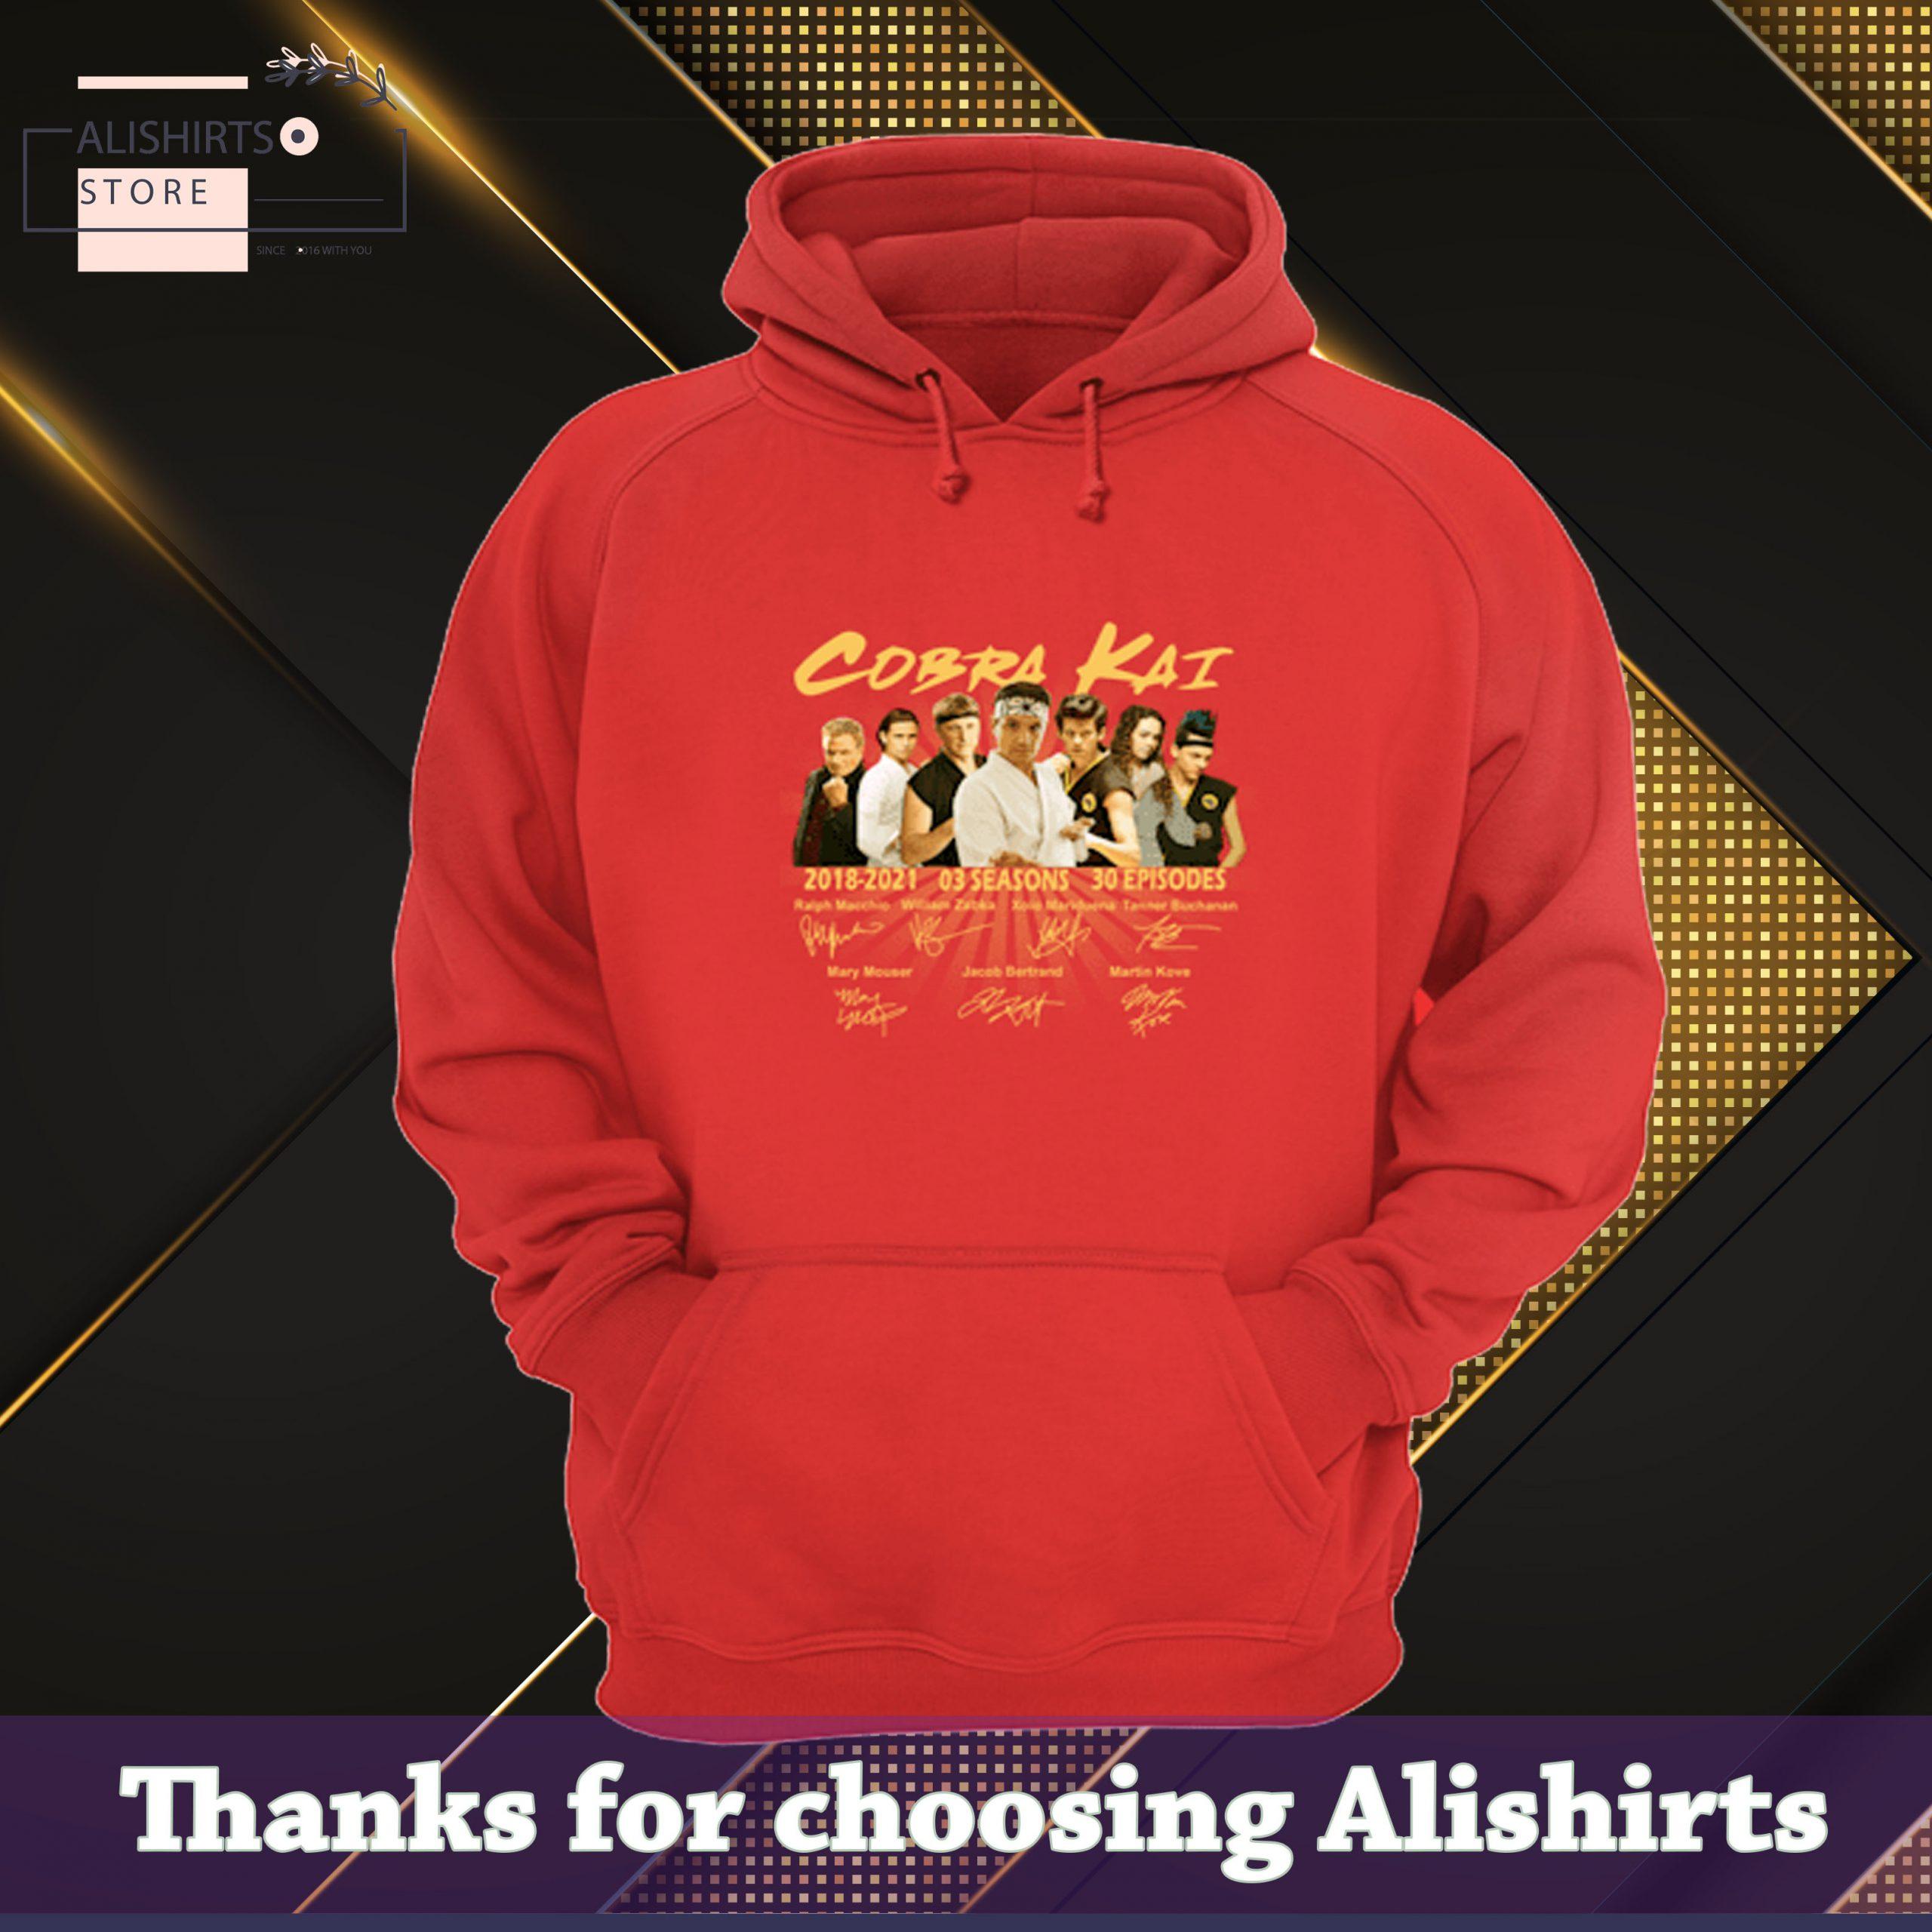 HOT Cobra Kai 2018 2021 03 Seasons Thank You For The Memories Signatures shirt, Hoodie, Tank Top